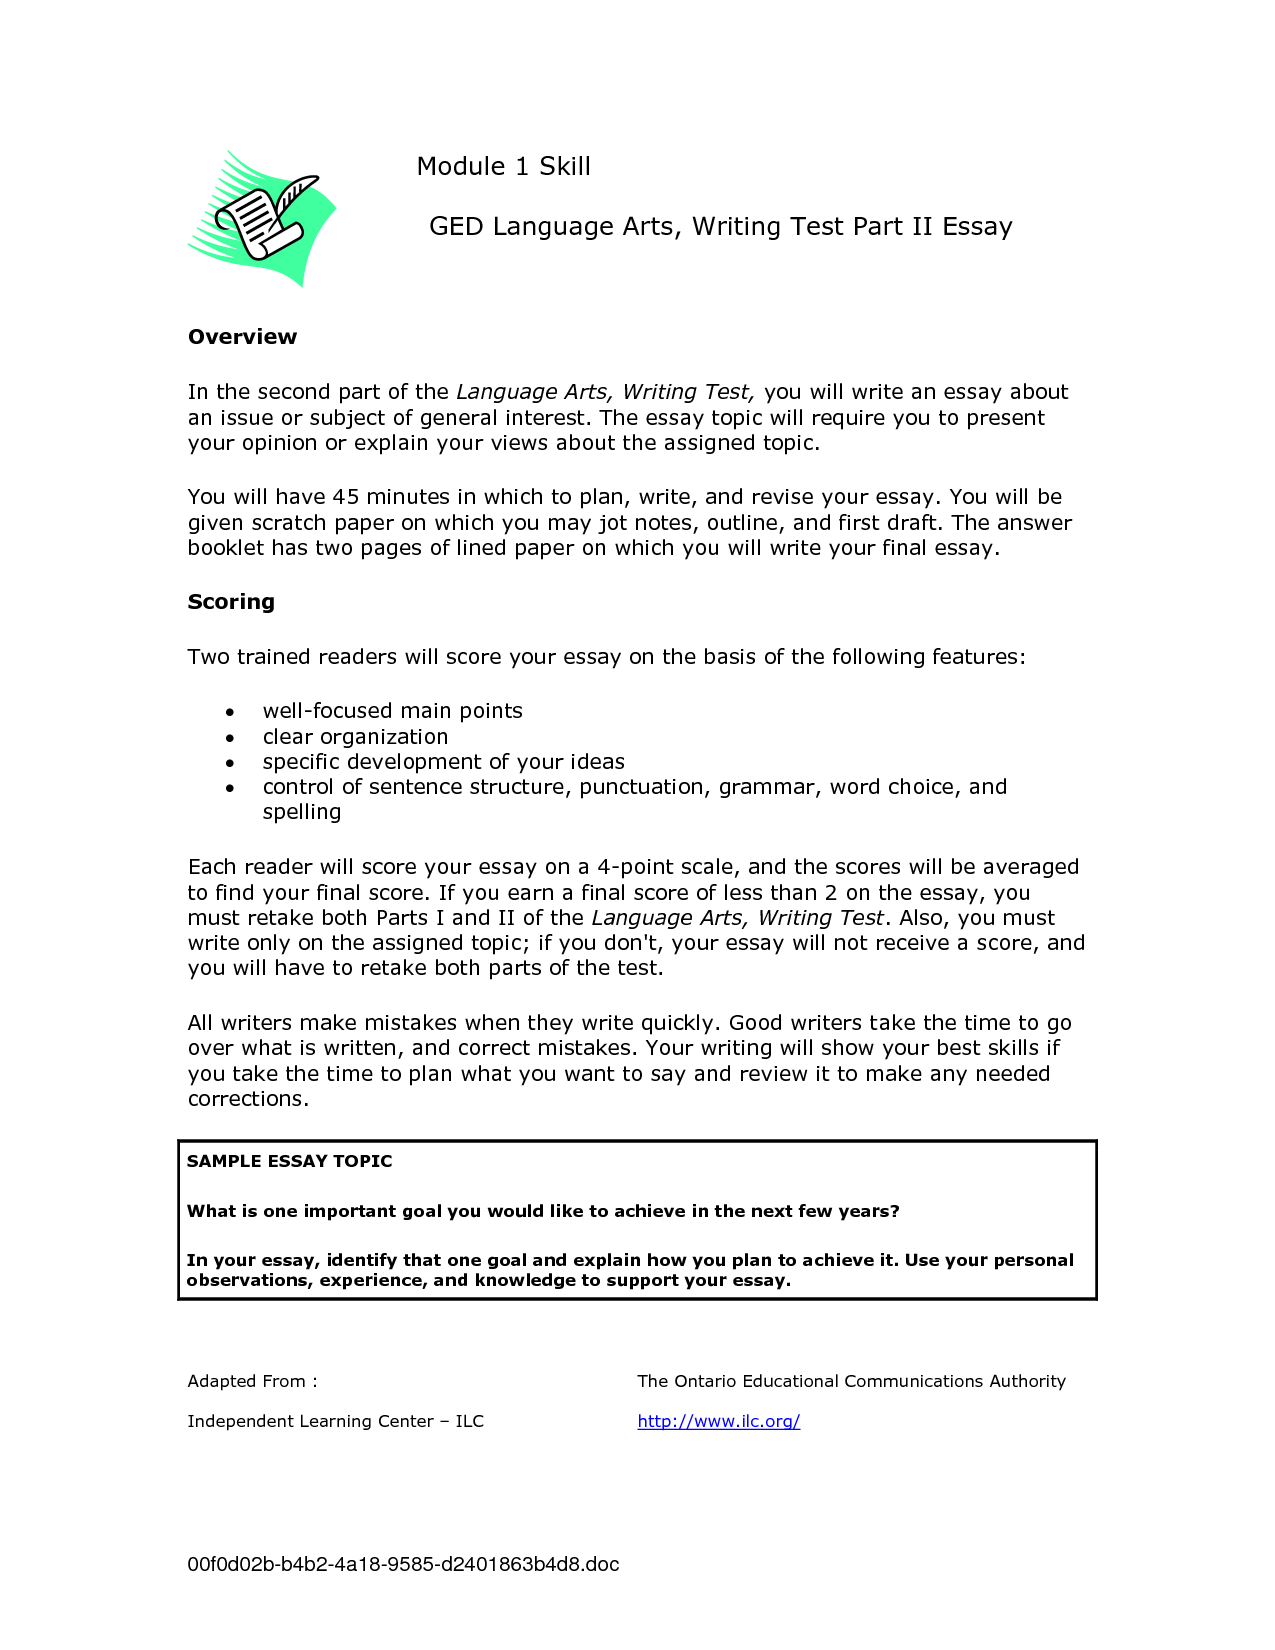 005 Ged Essay Topics Writing Test Samples 109105 Stirring List Examples Pdf Full